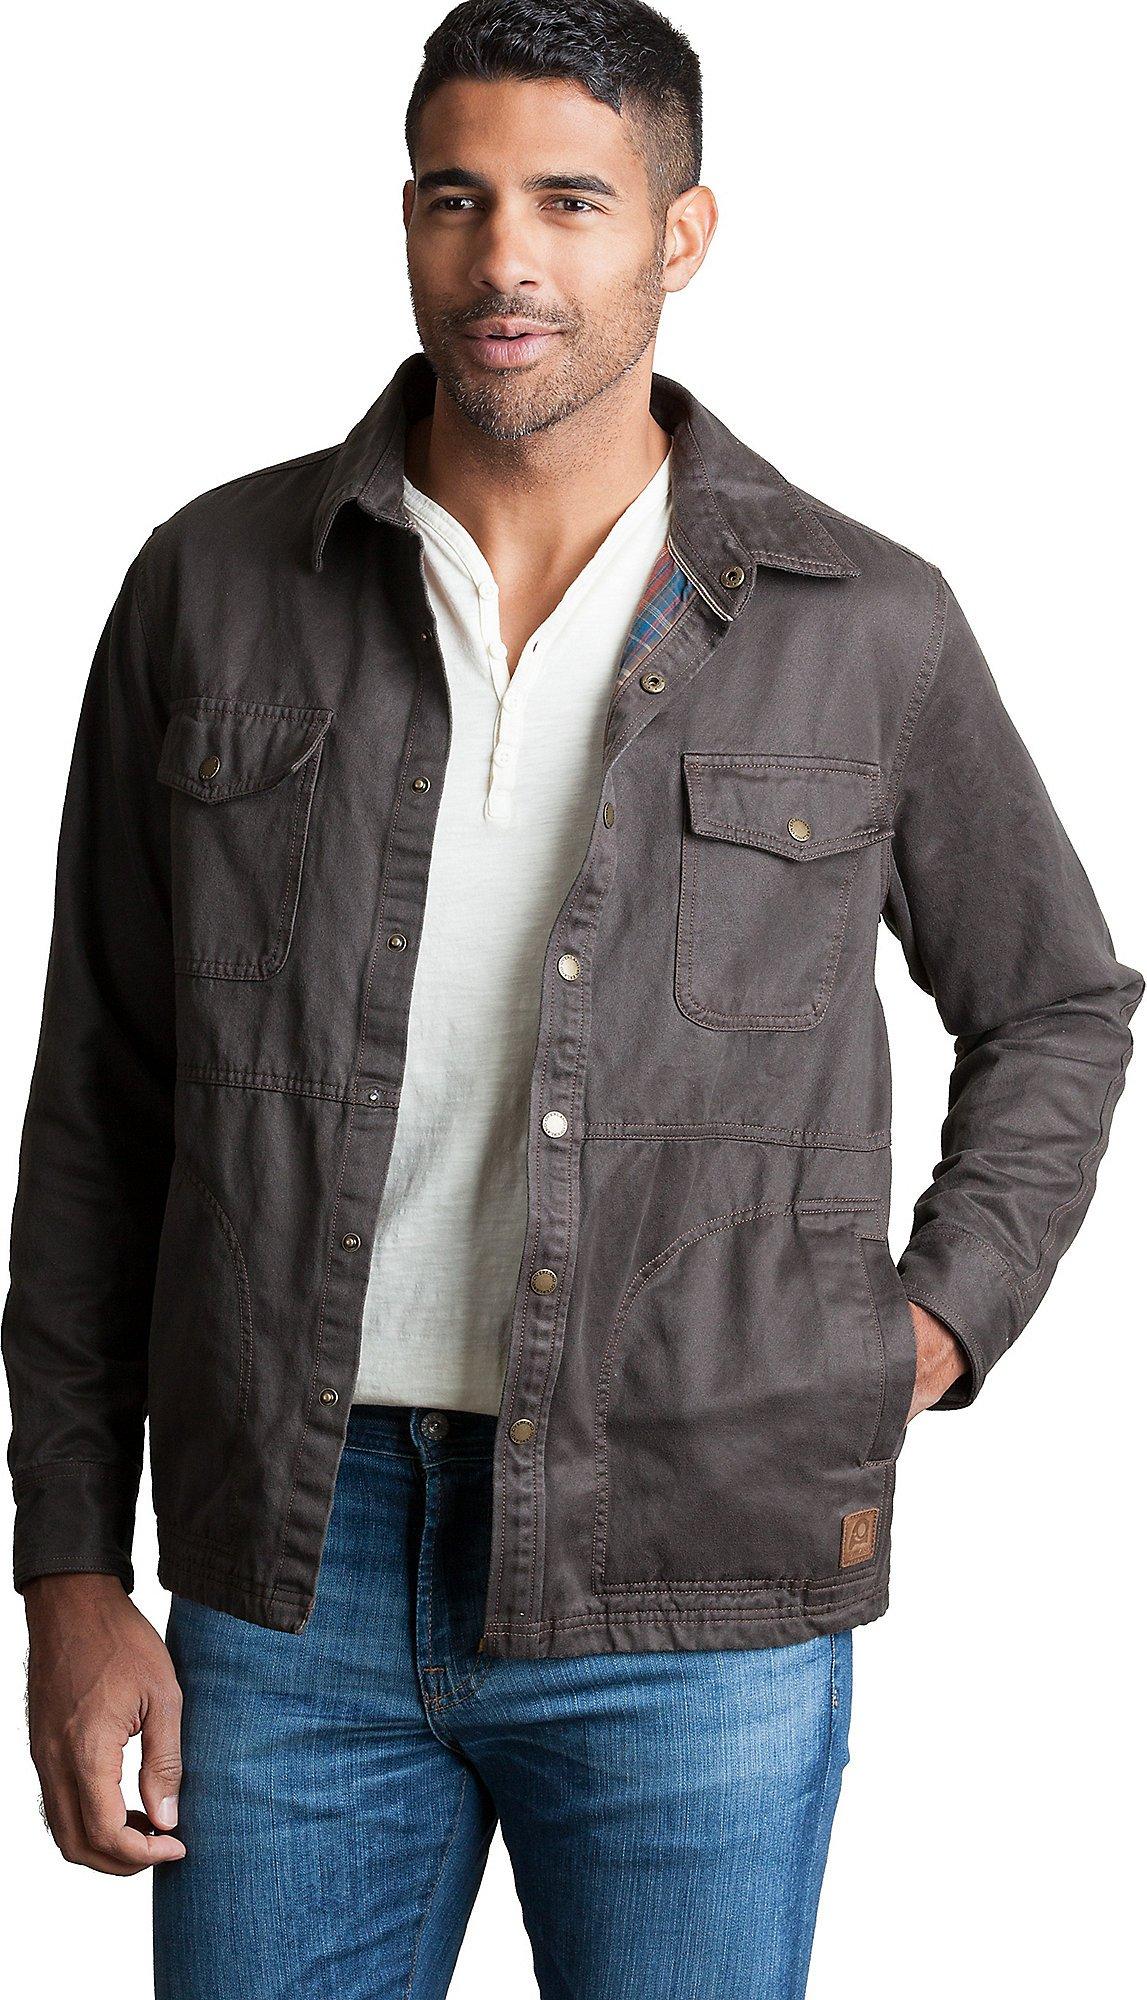 Westin Coated Cotton-Blend Jacket, Brown, Size XXLarge (50-52)